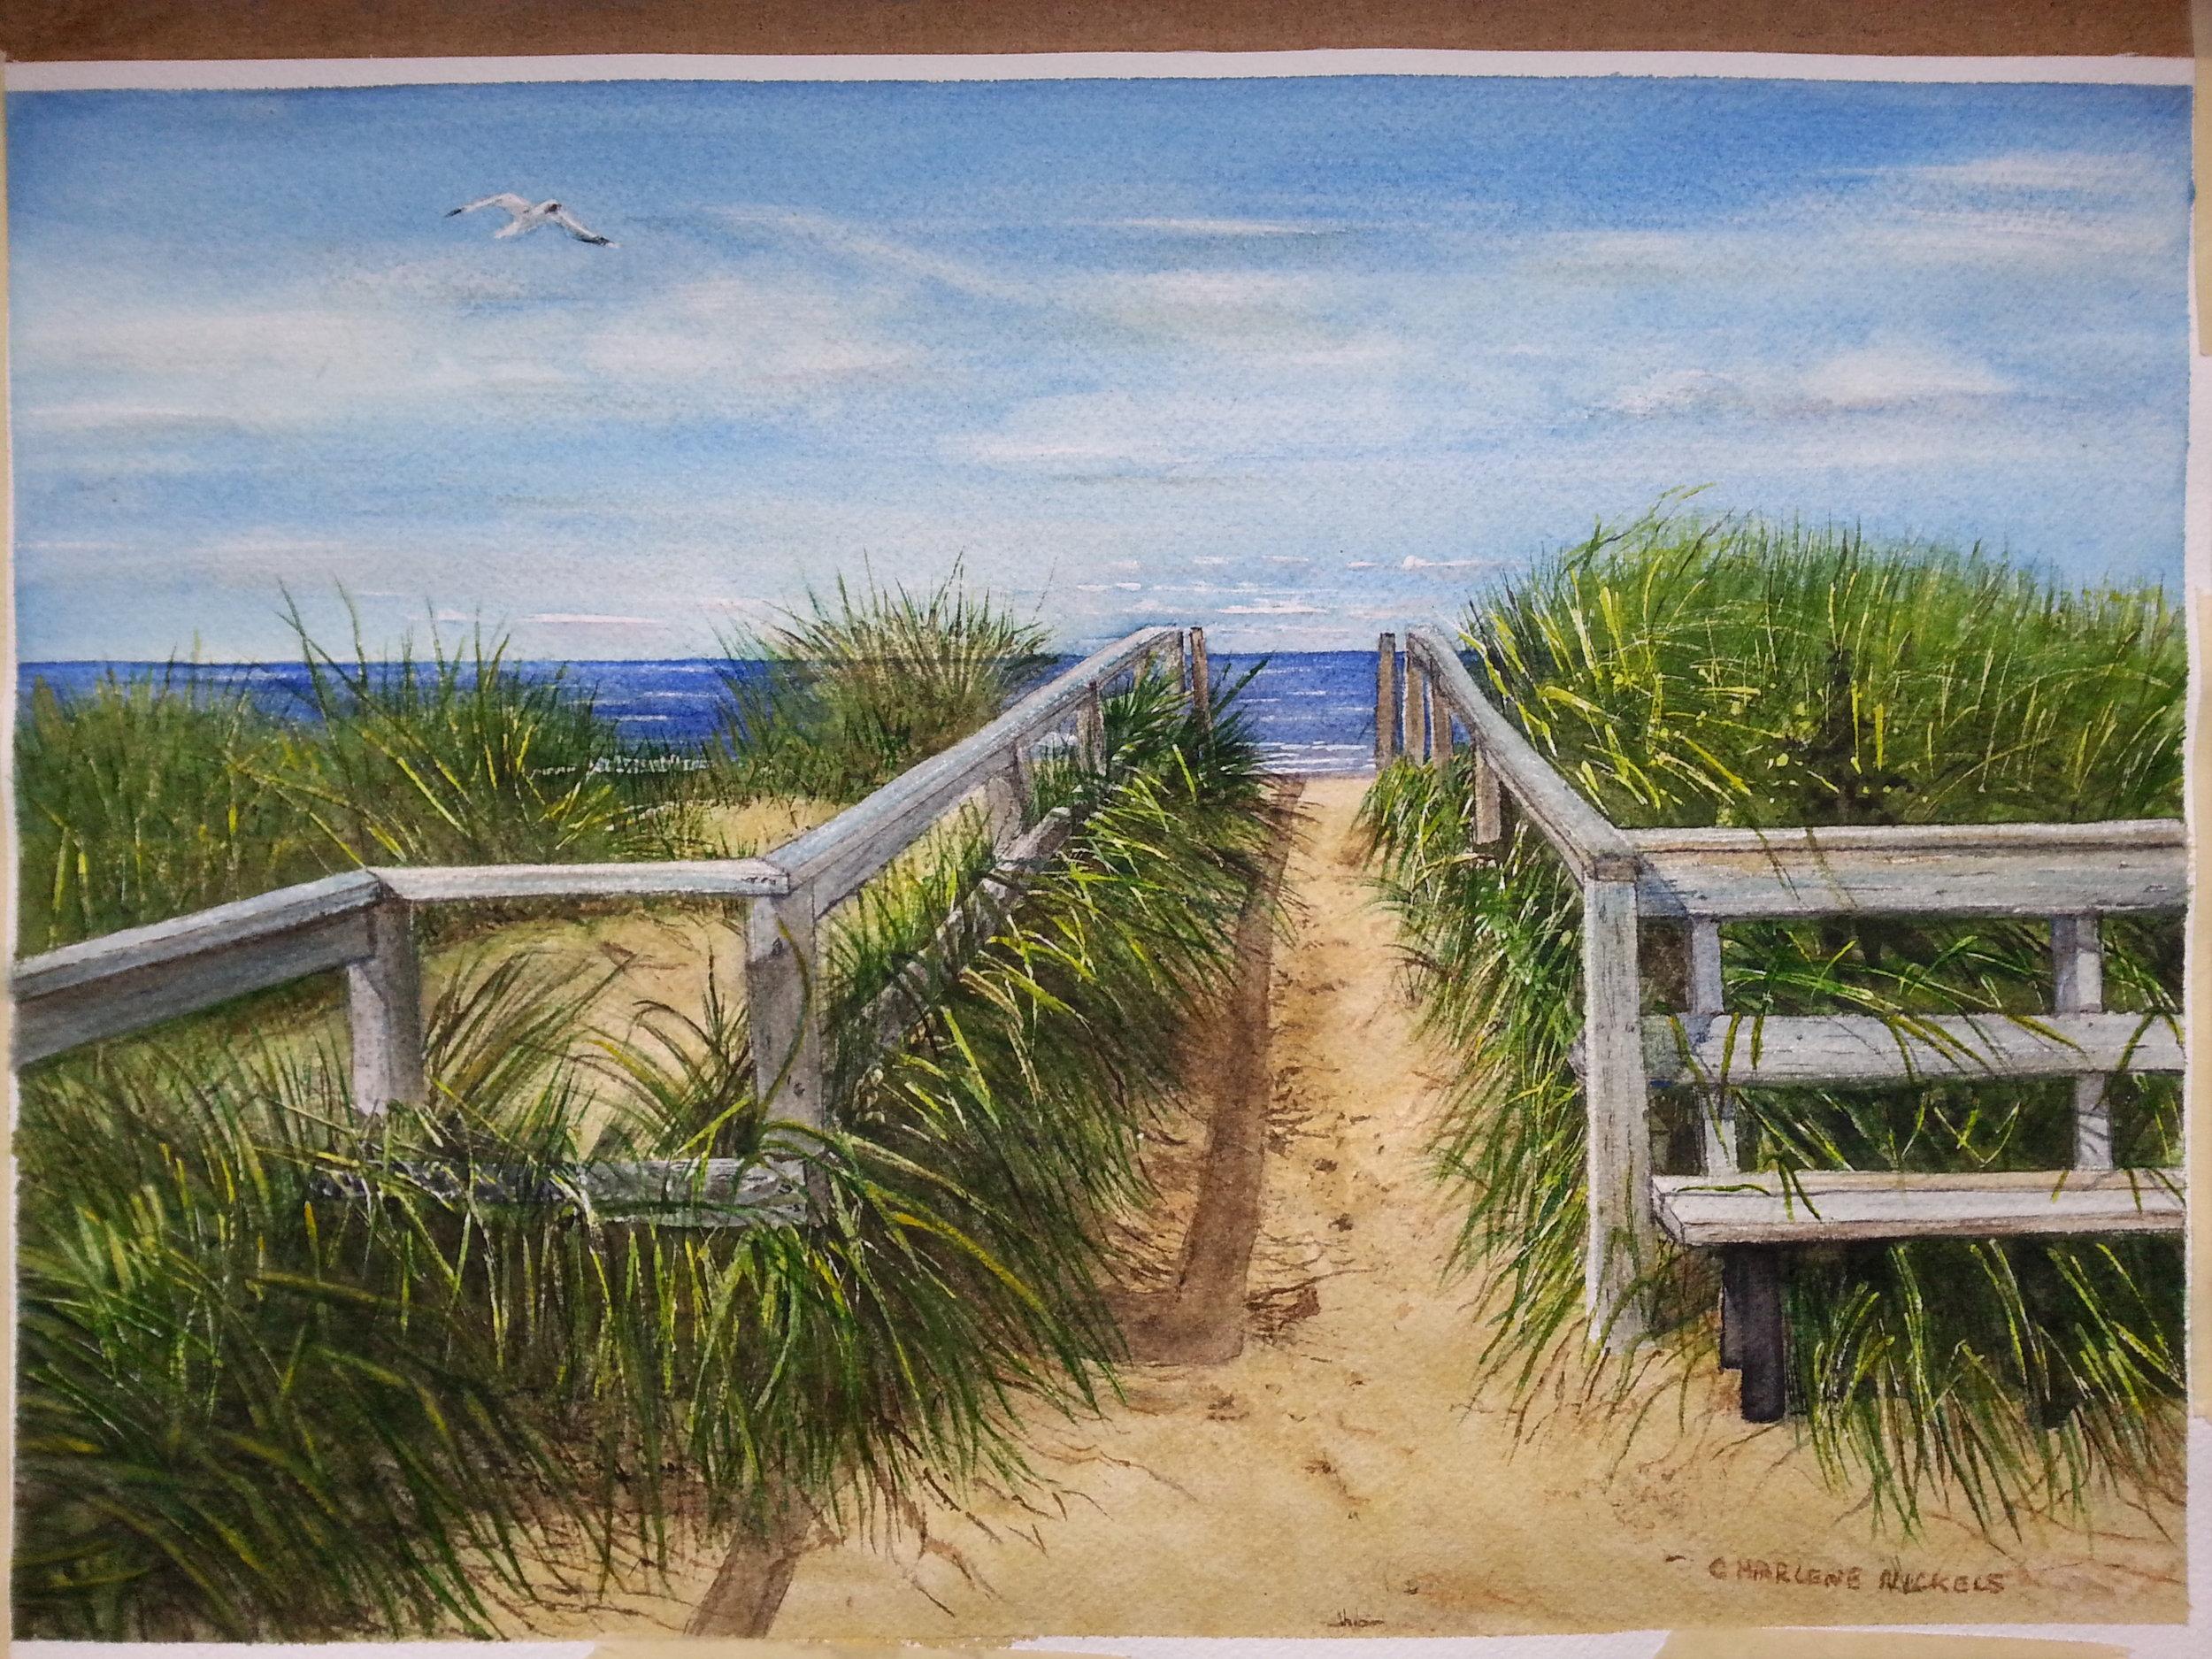 Lakeside Sand Dunes by Charlene Nickels